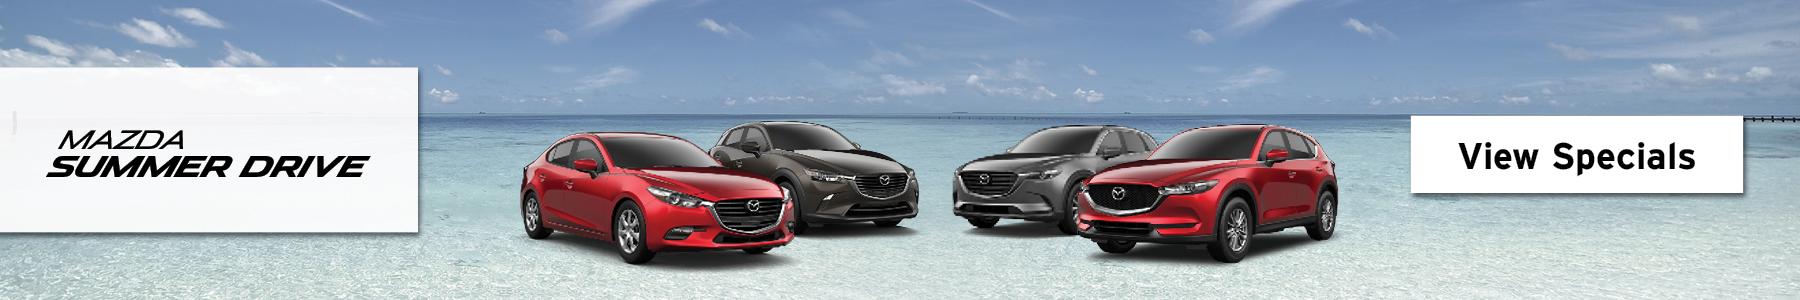 Mazda Summer Drive. View Specials.